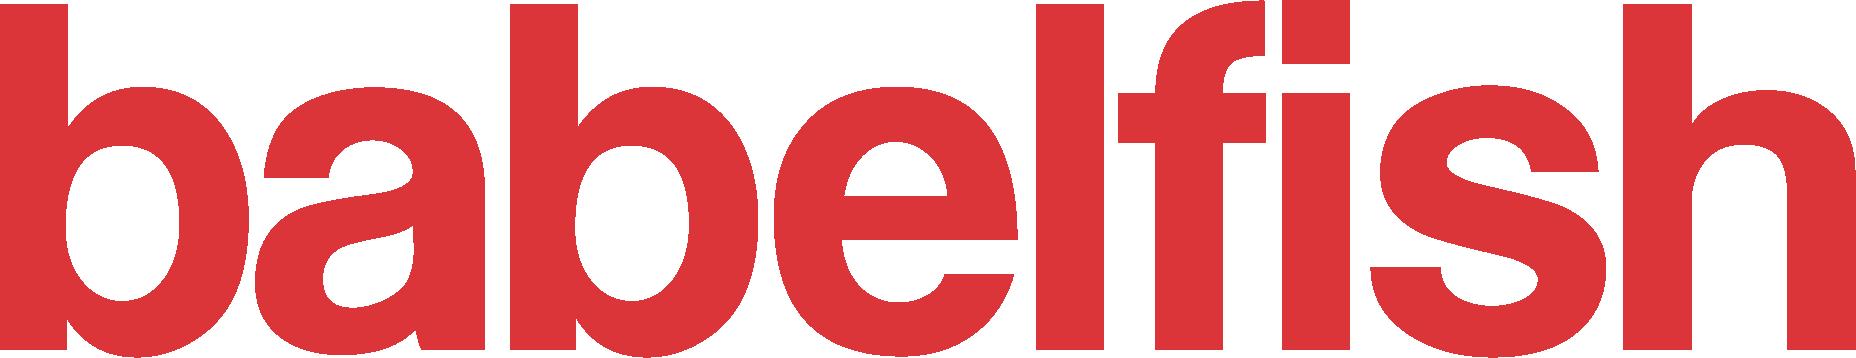 Babelfish Tech Pvt. Ltd. - Business Intelligence company logo